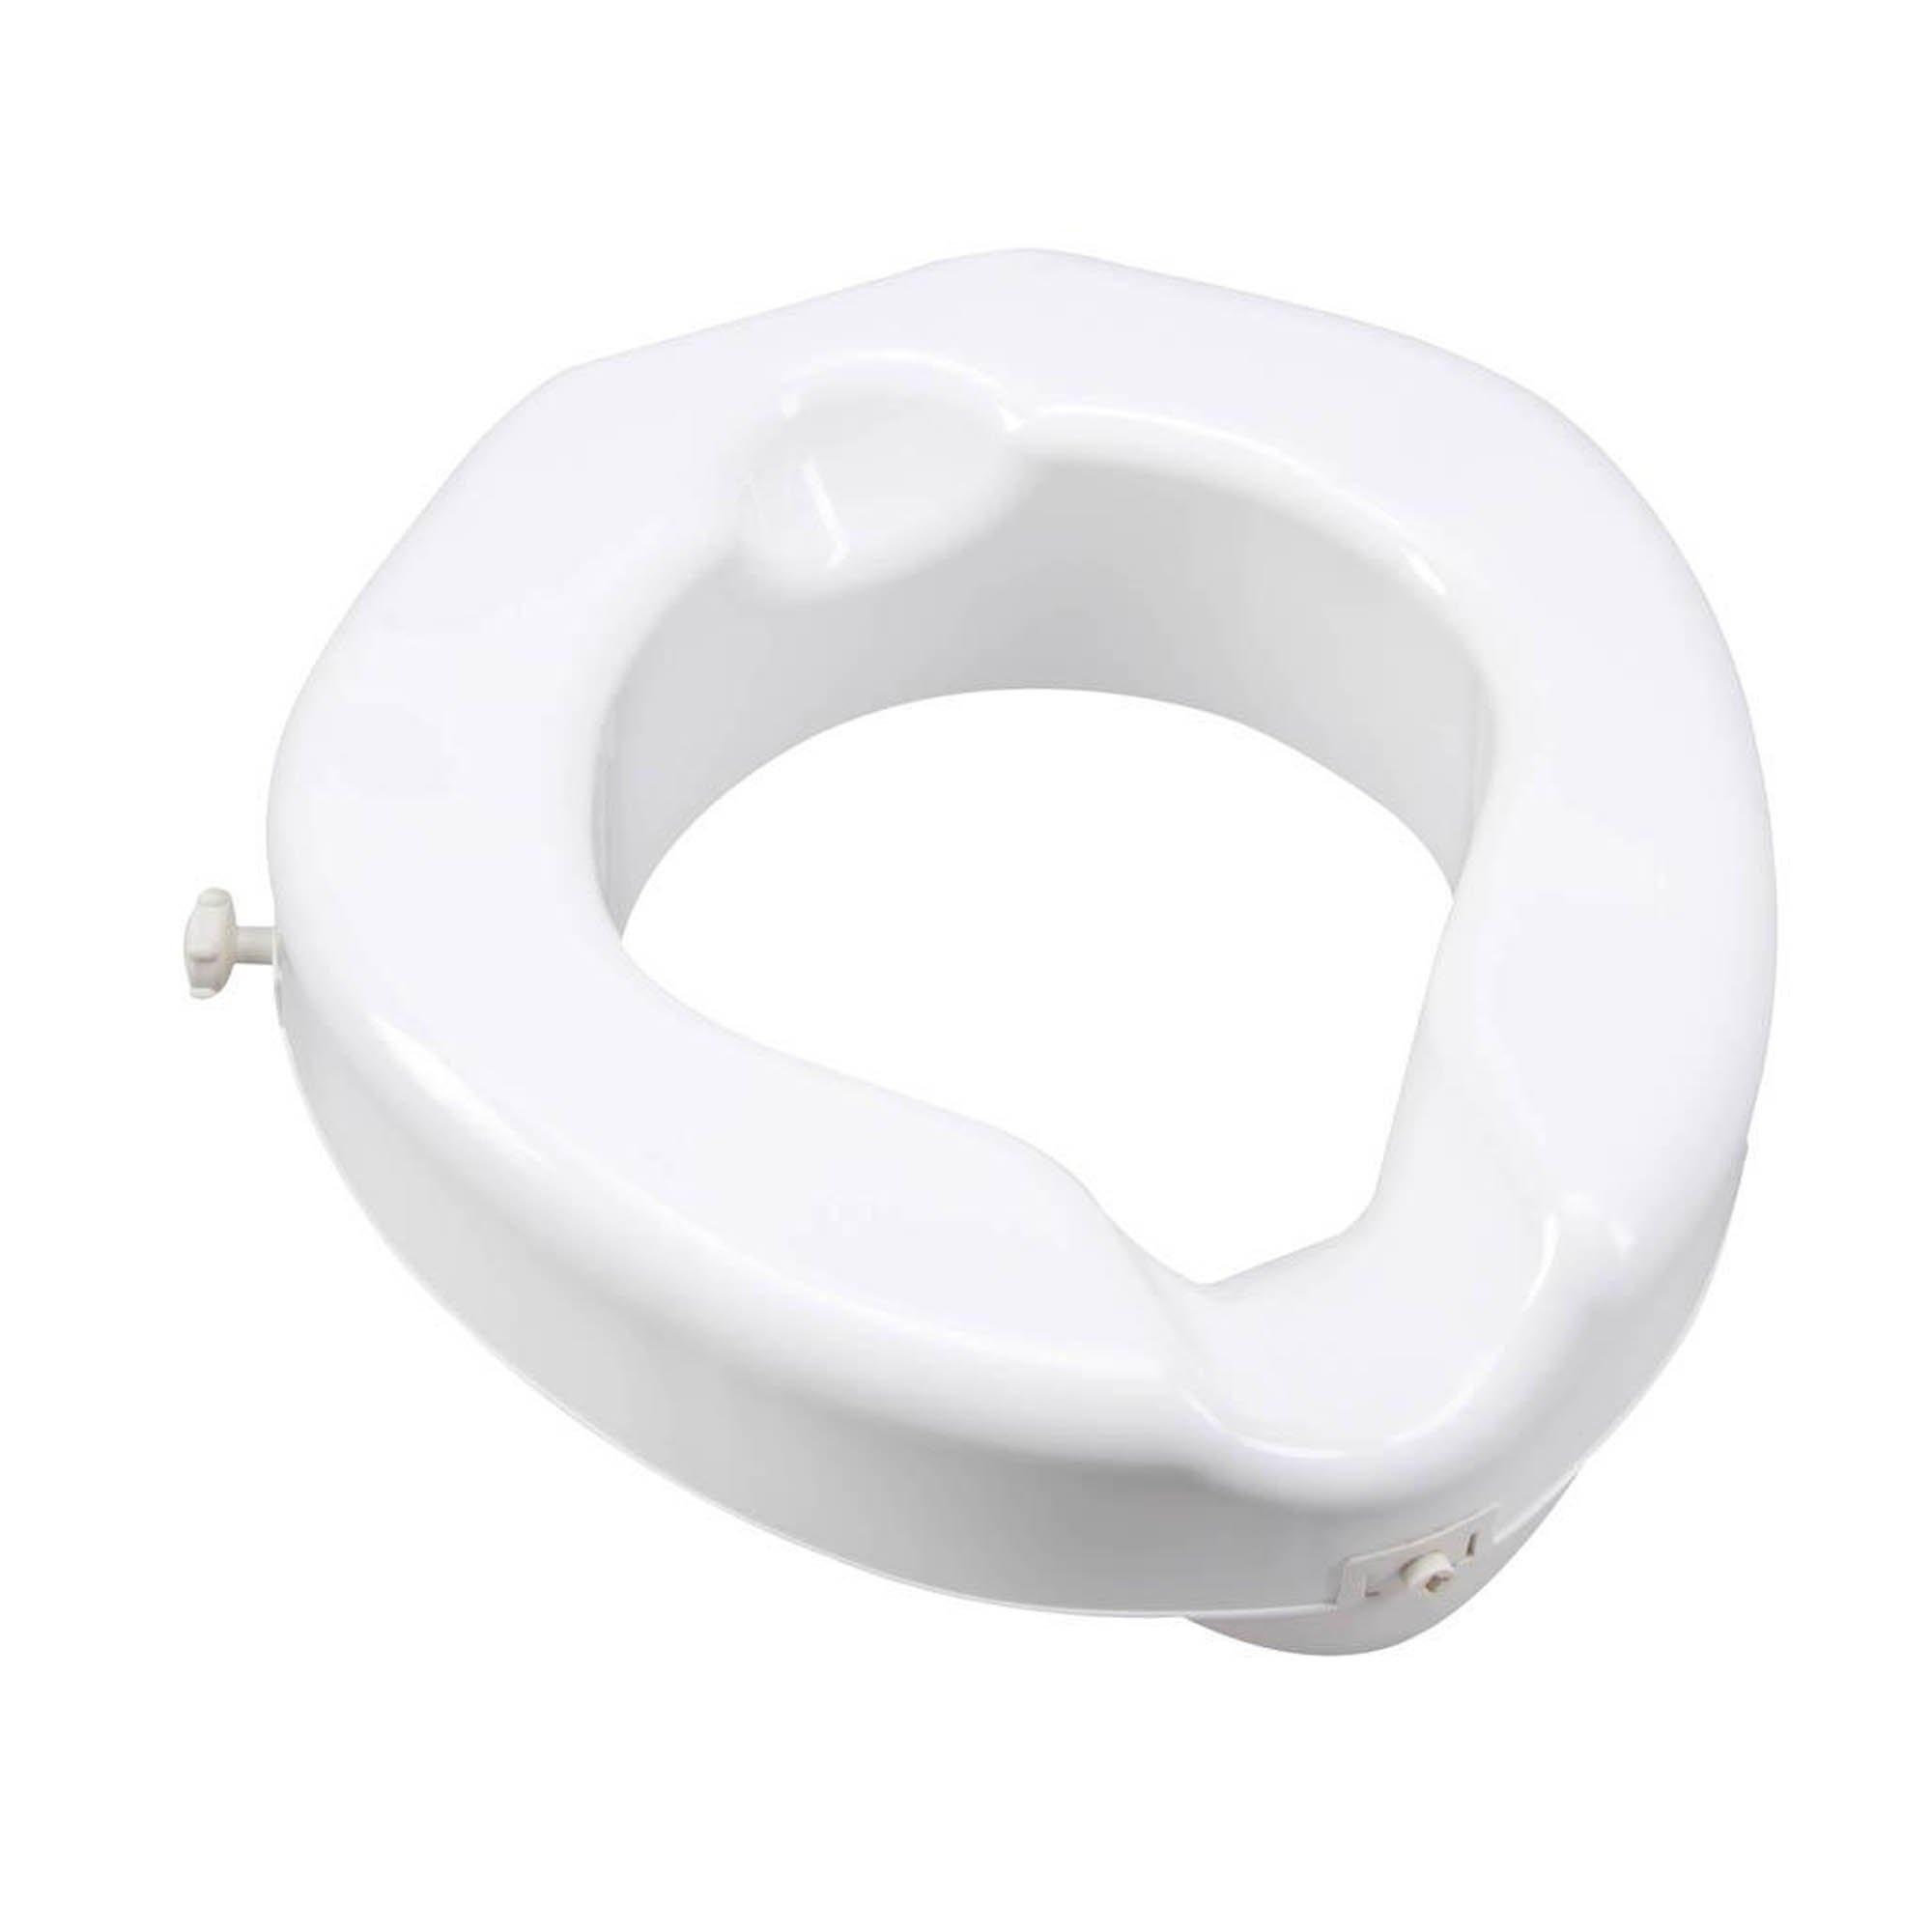 Carex Bariatric Safe Lock Raised Toilet Seat, FGB31300-0000, 1 Each